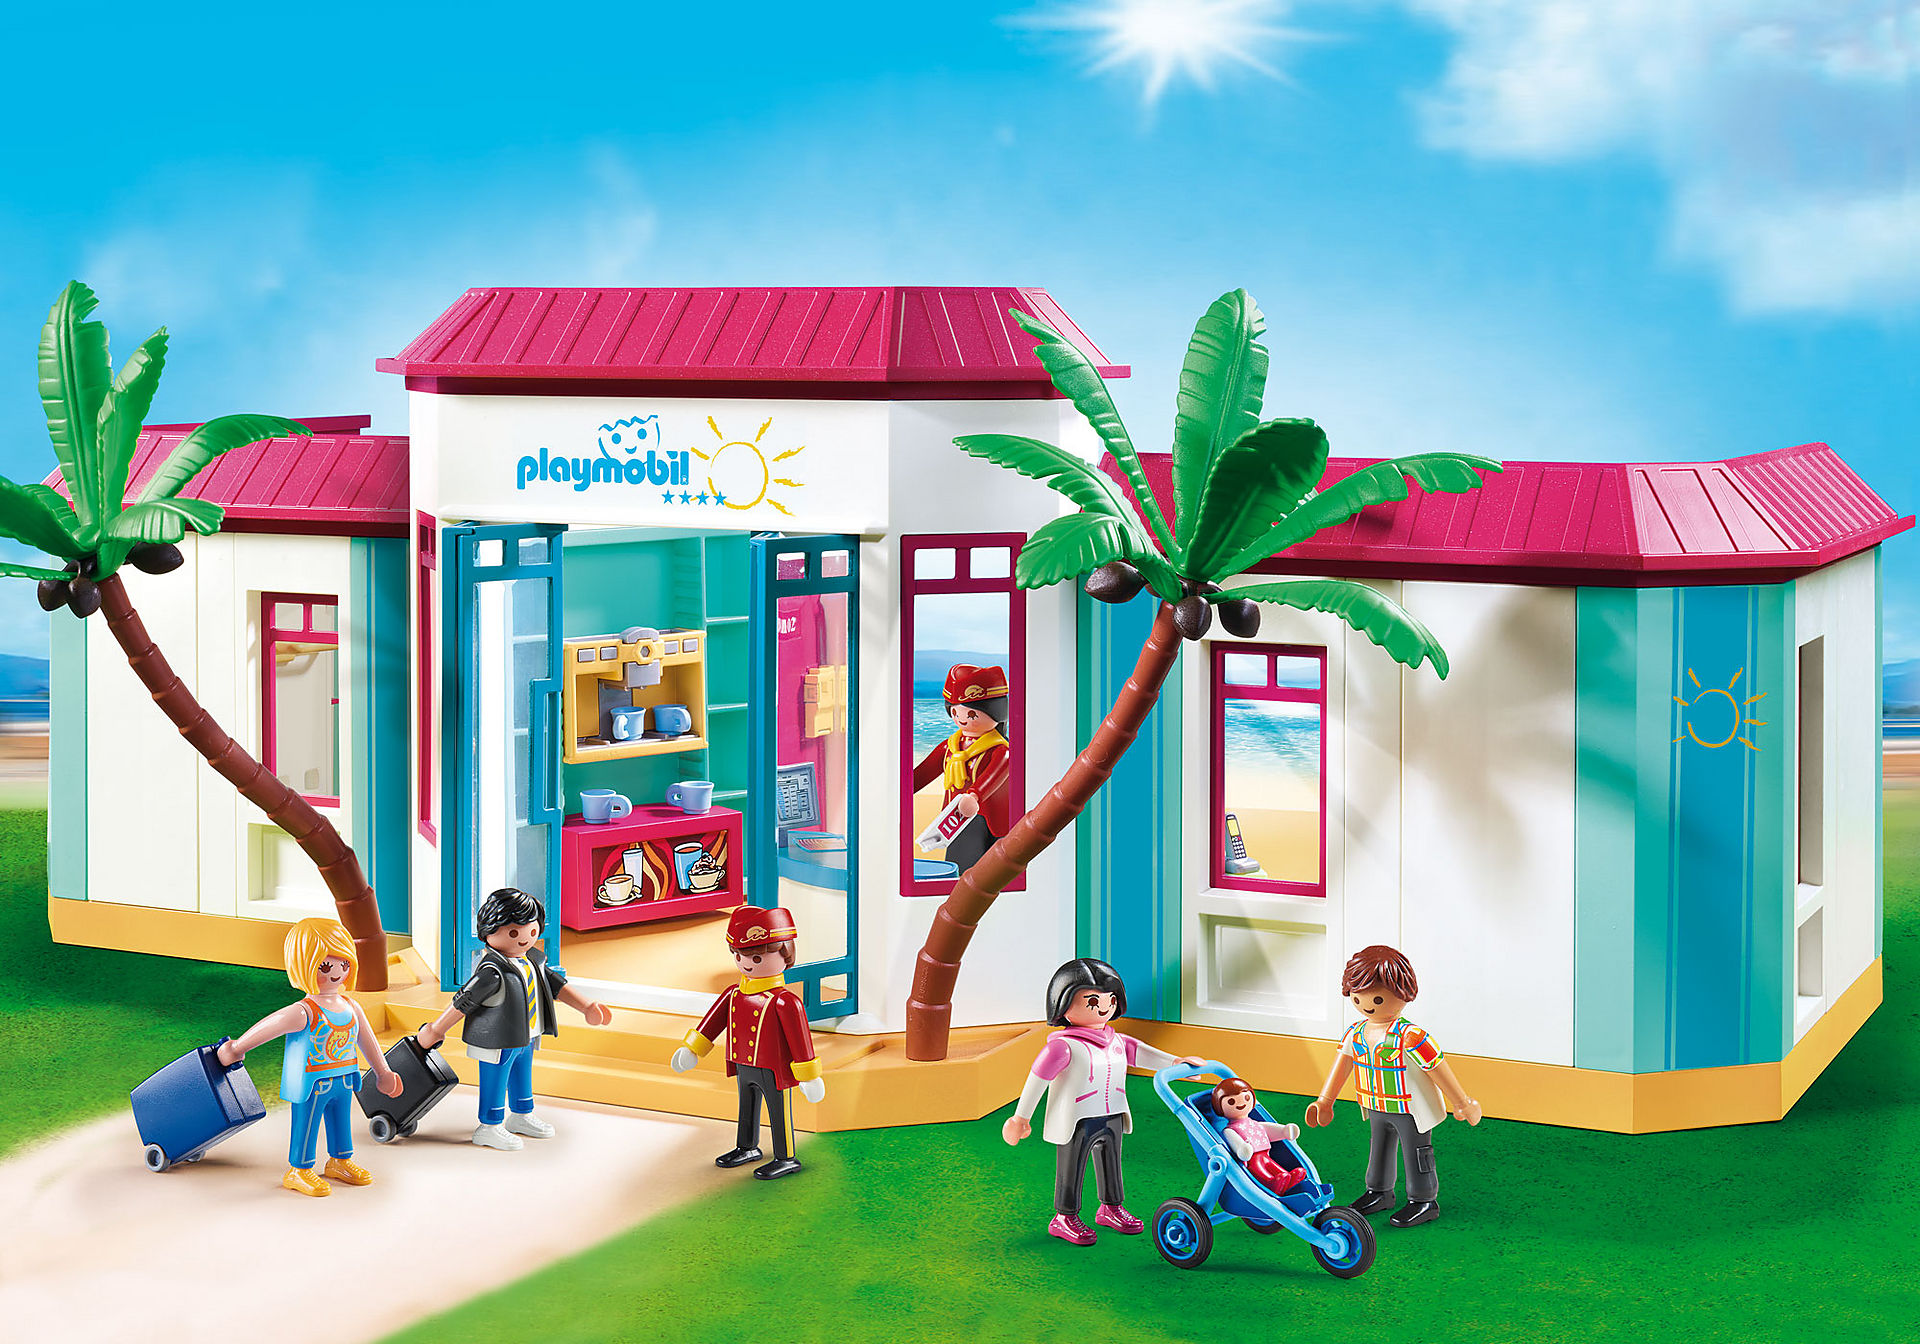 9539 Playmobil Inn zoom image1